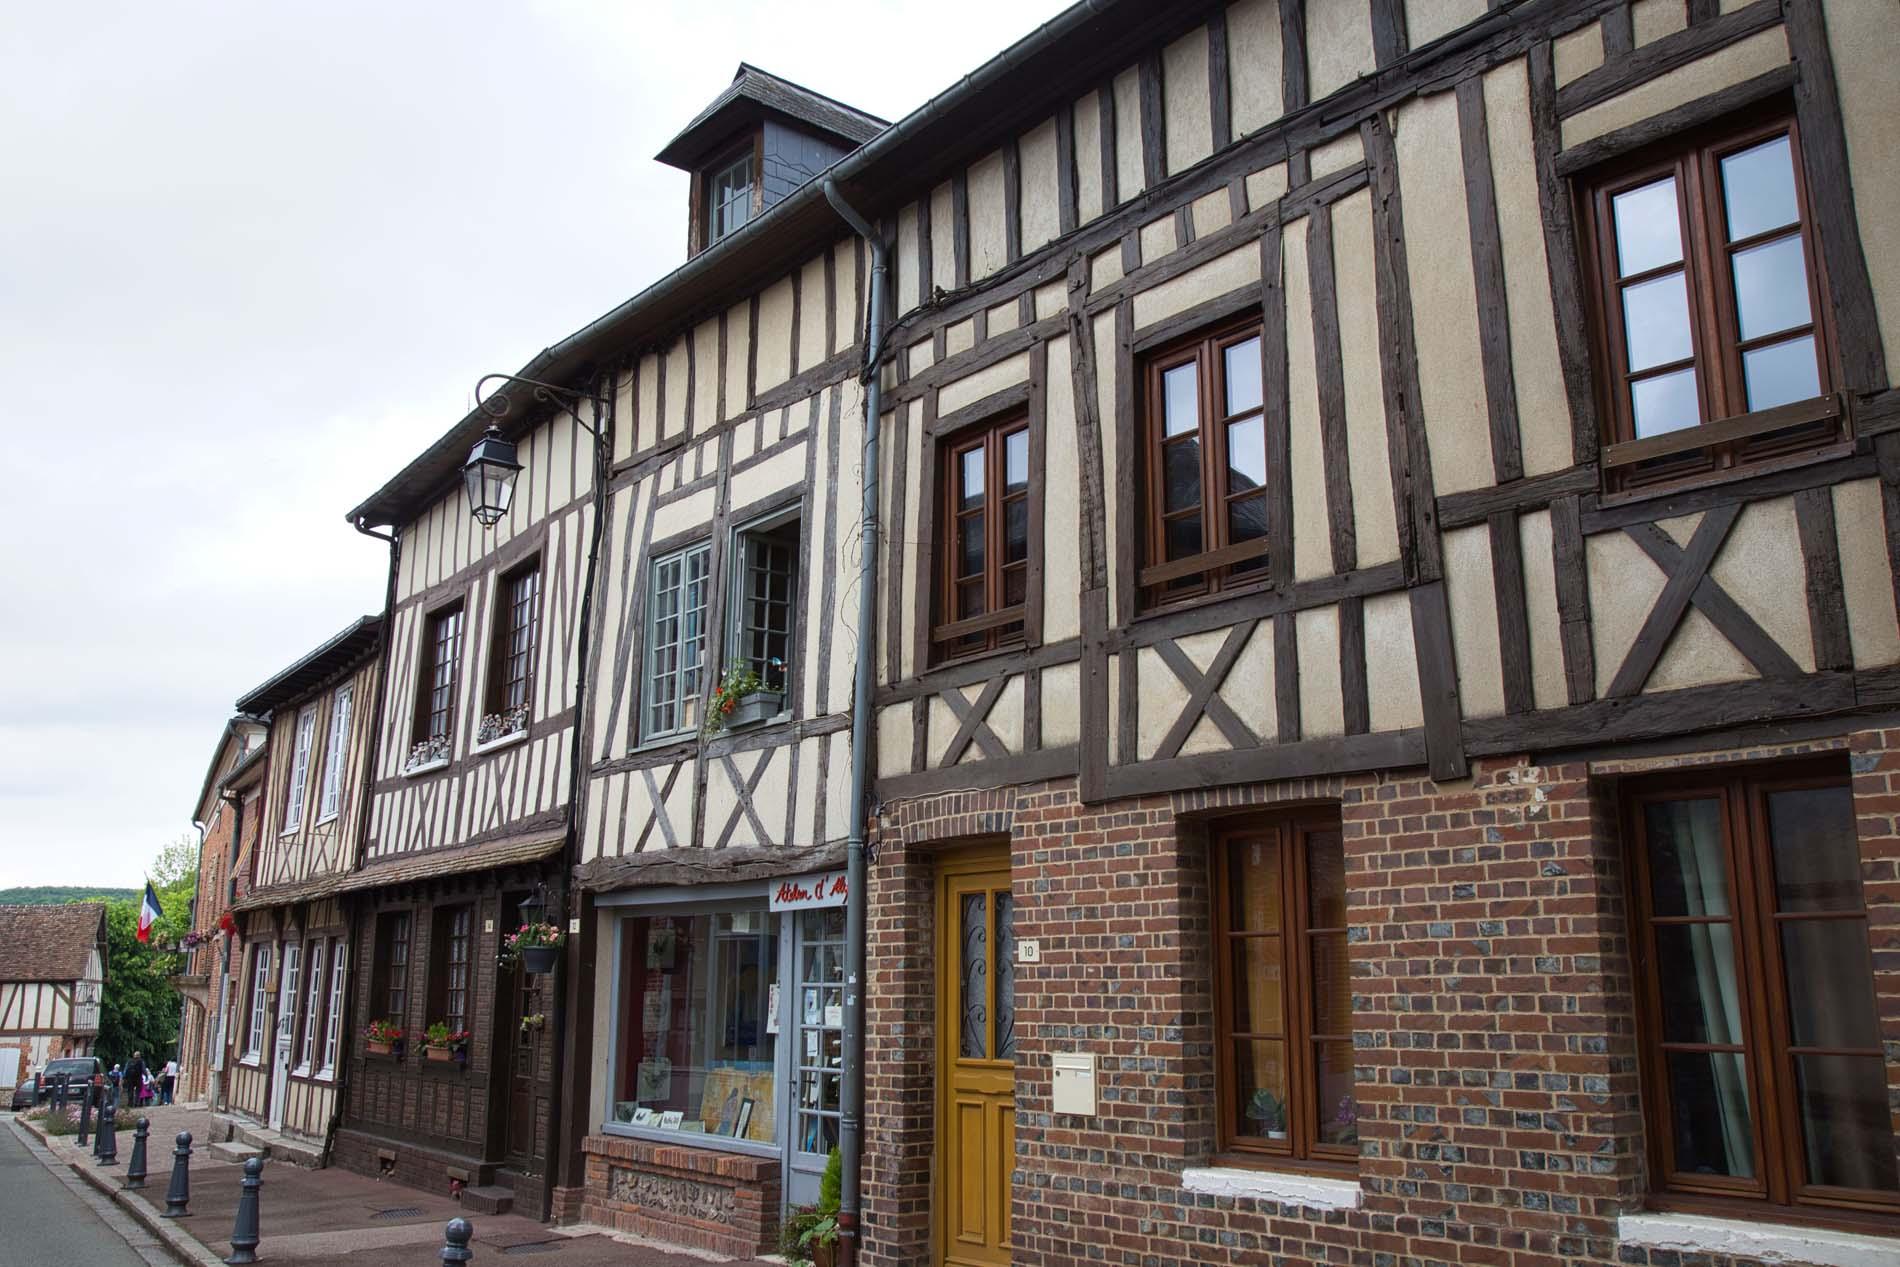 Lyons la Foret